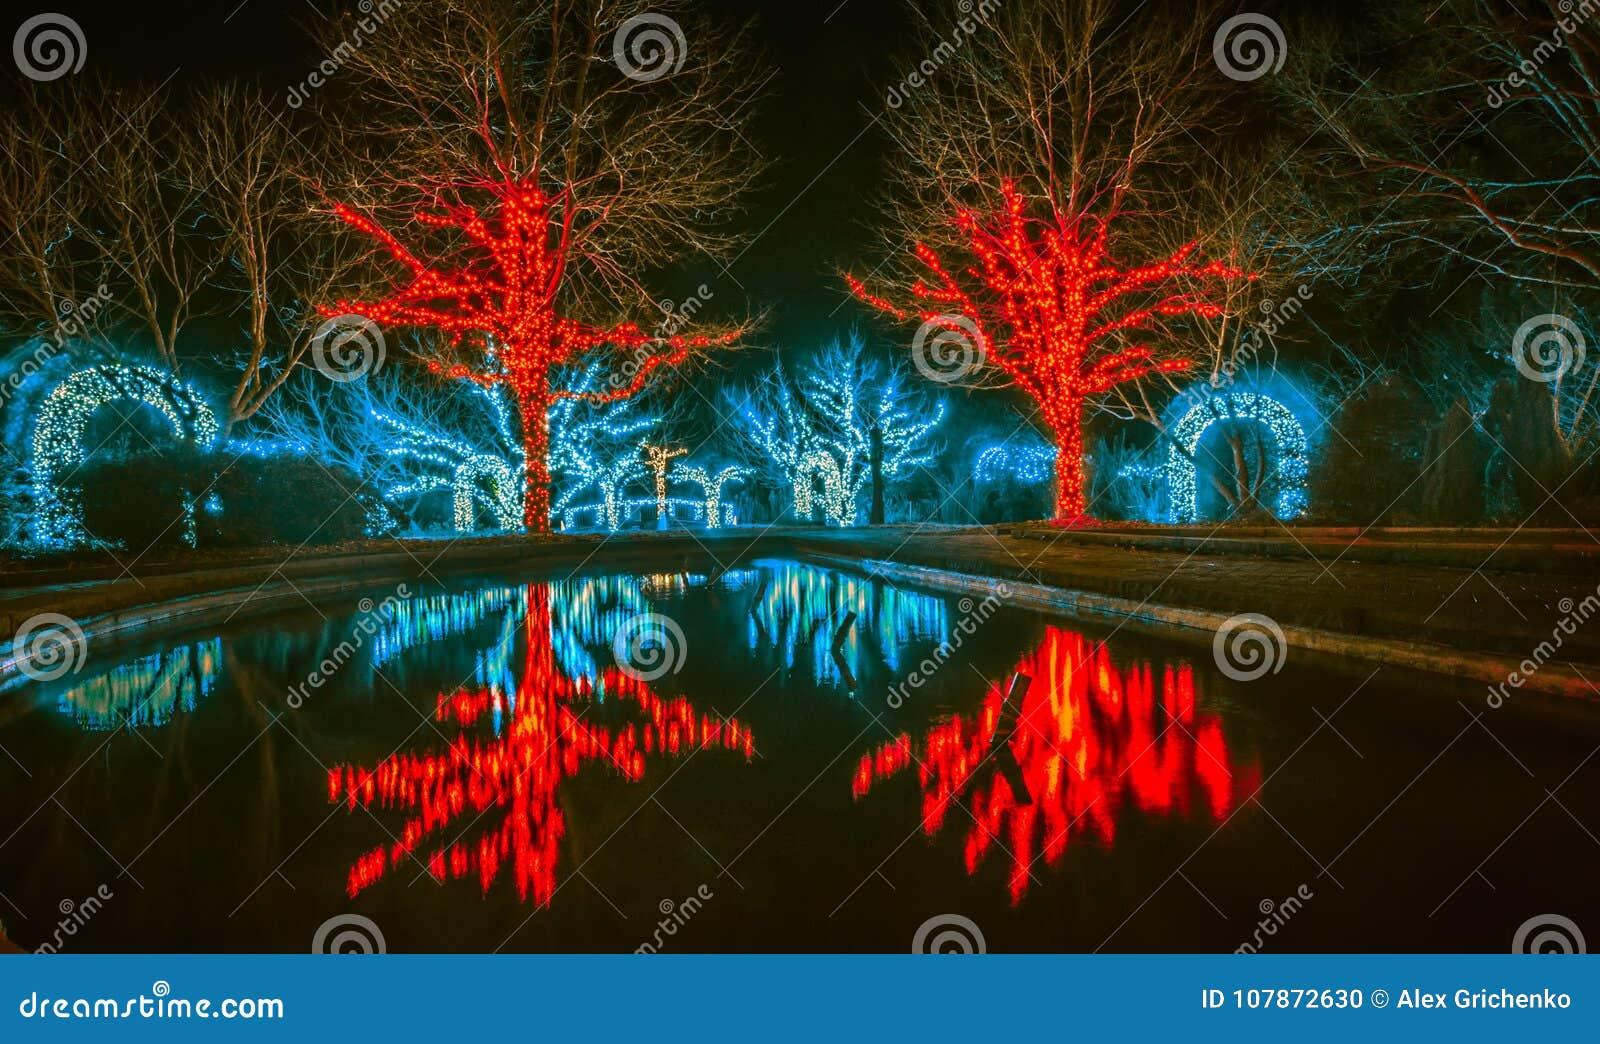 Christmas season lights and decorations at daniel stowe gardens